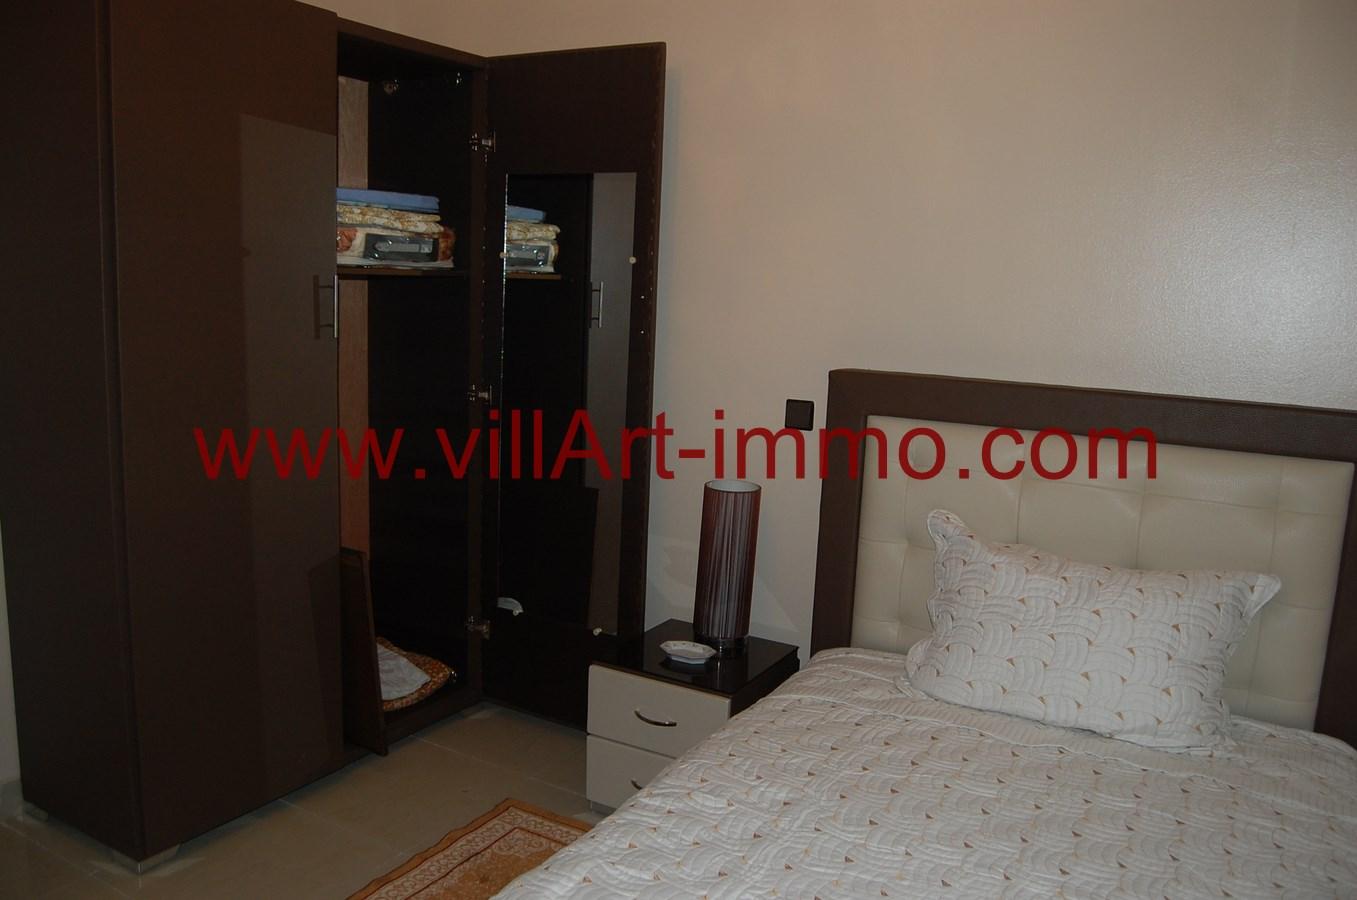 10-location-appartement-meuble-iberia-tanger-chambre-1-l895-villart-immo